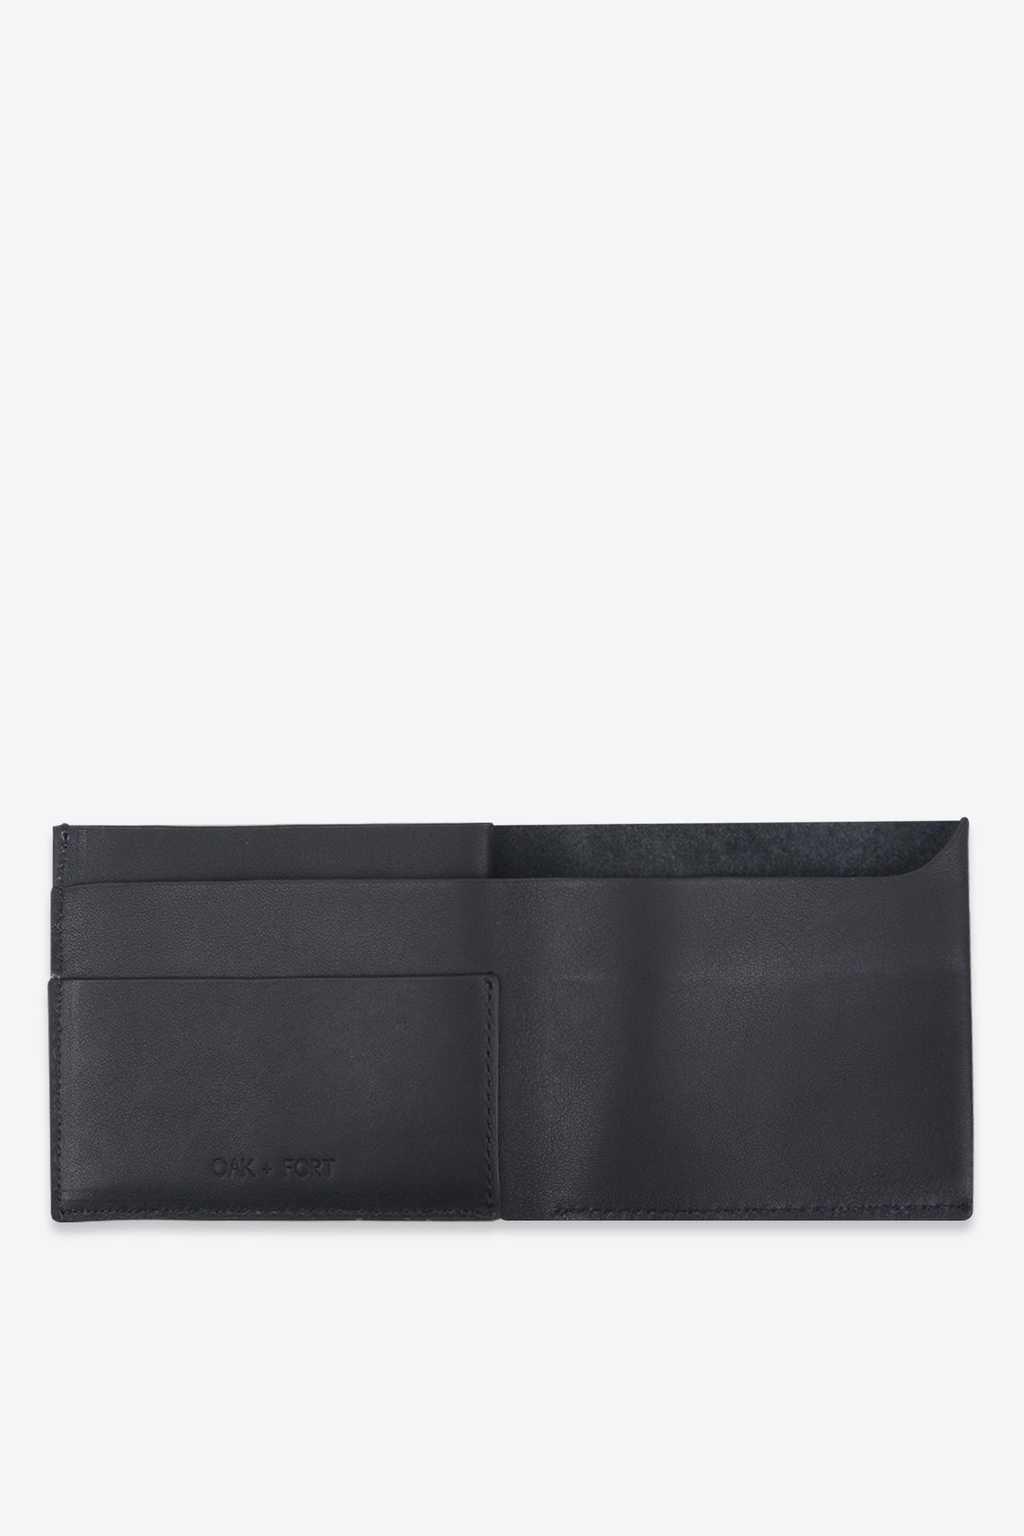 Wallet 1256 Black 6